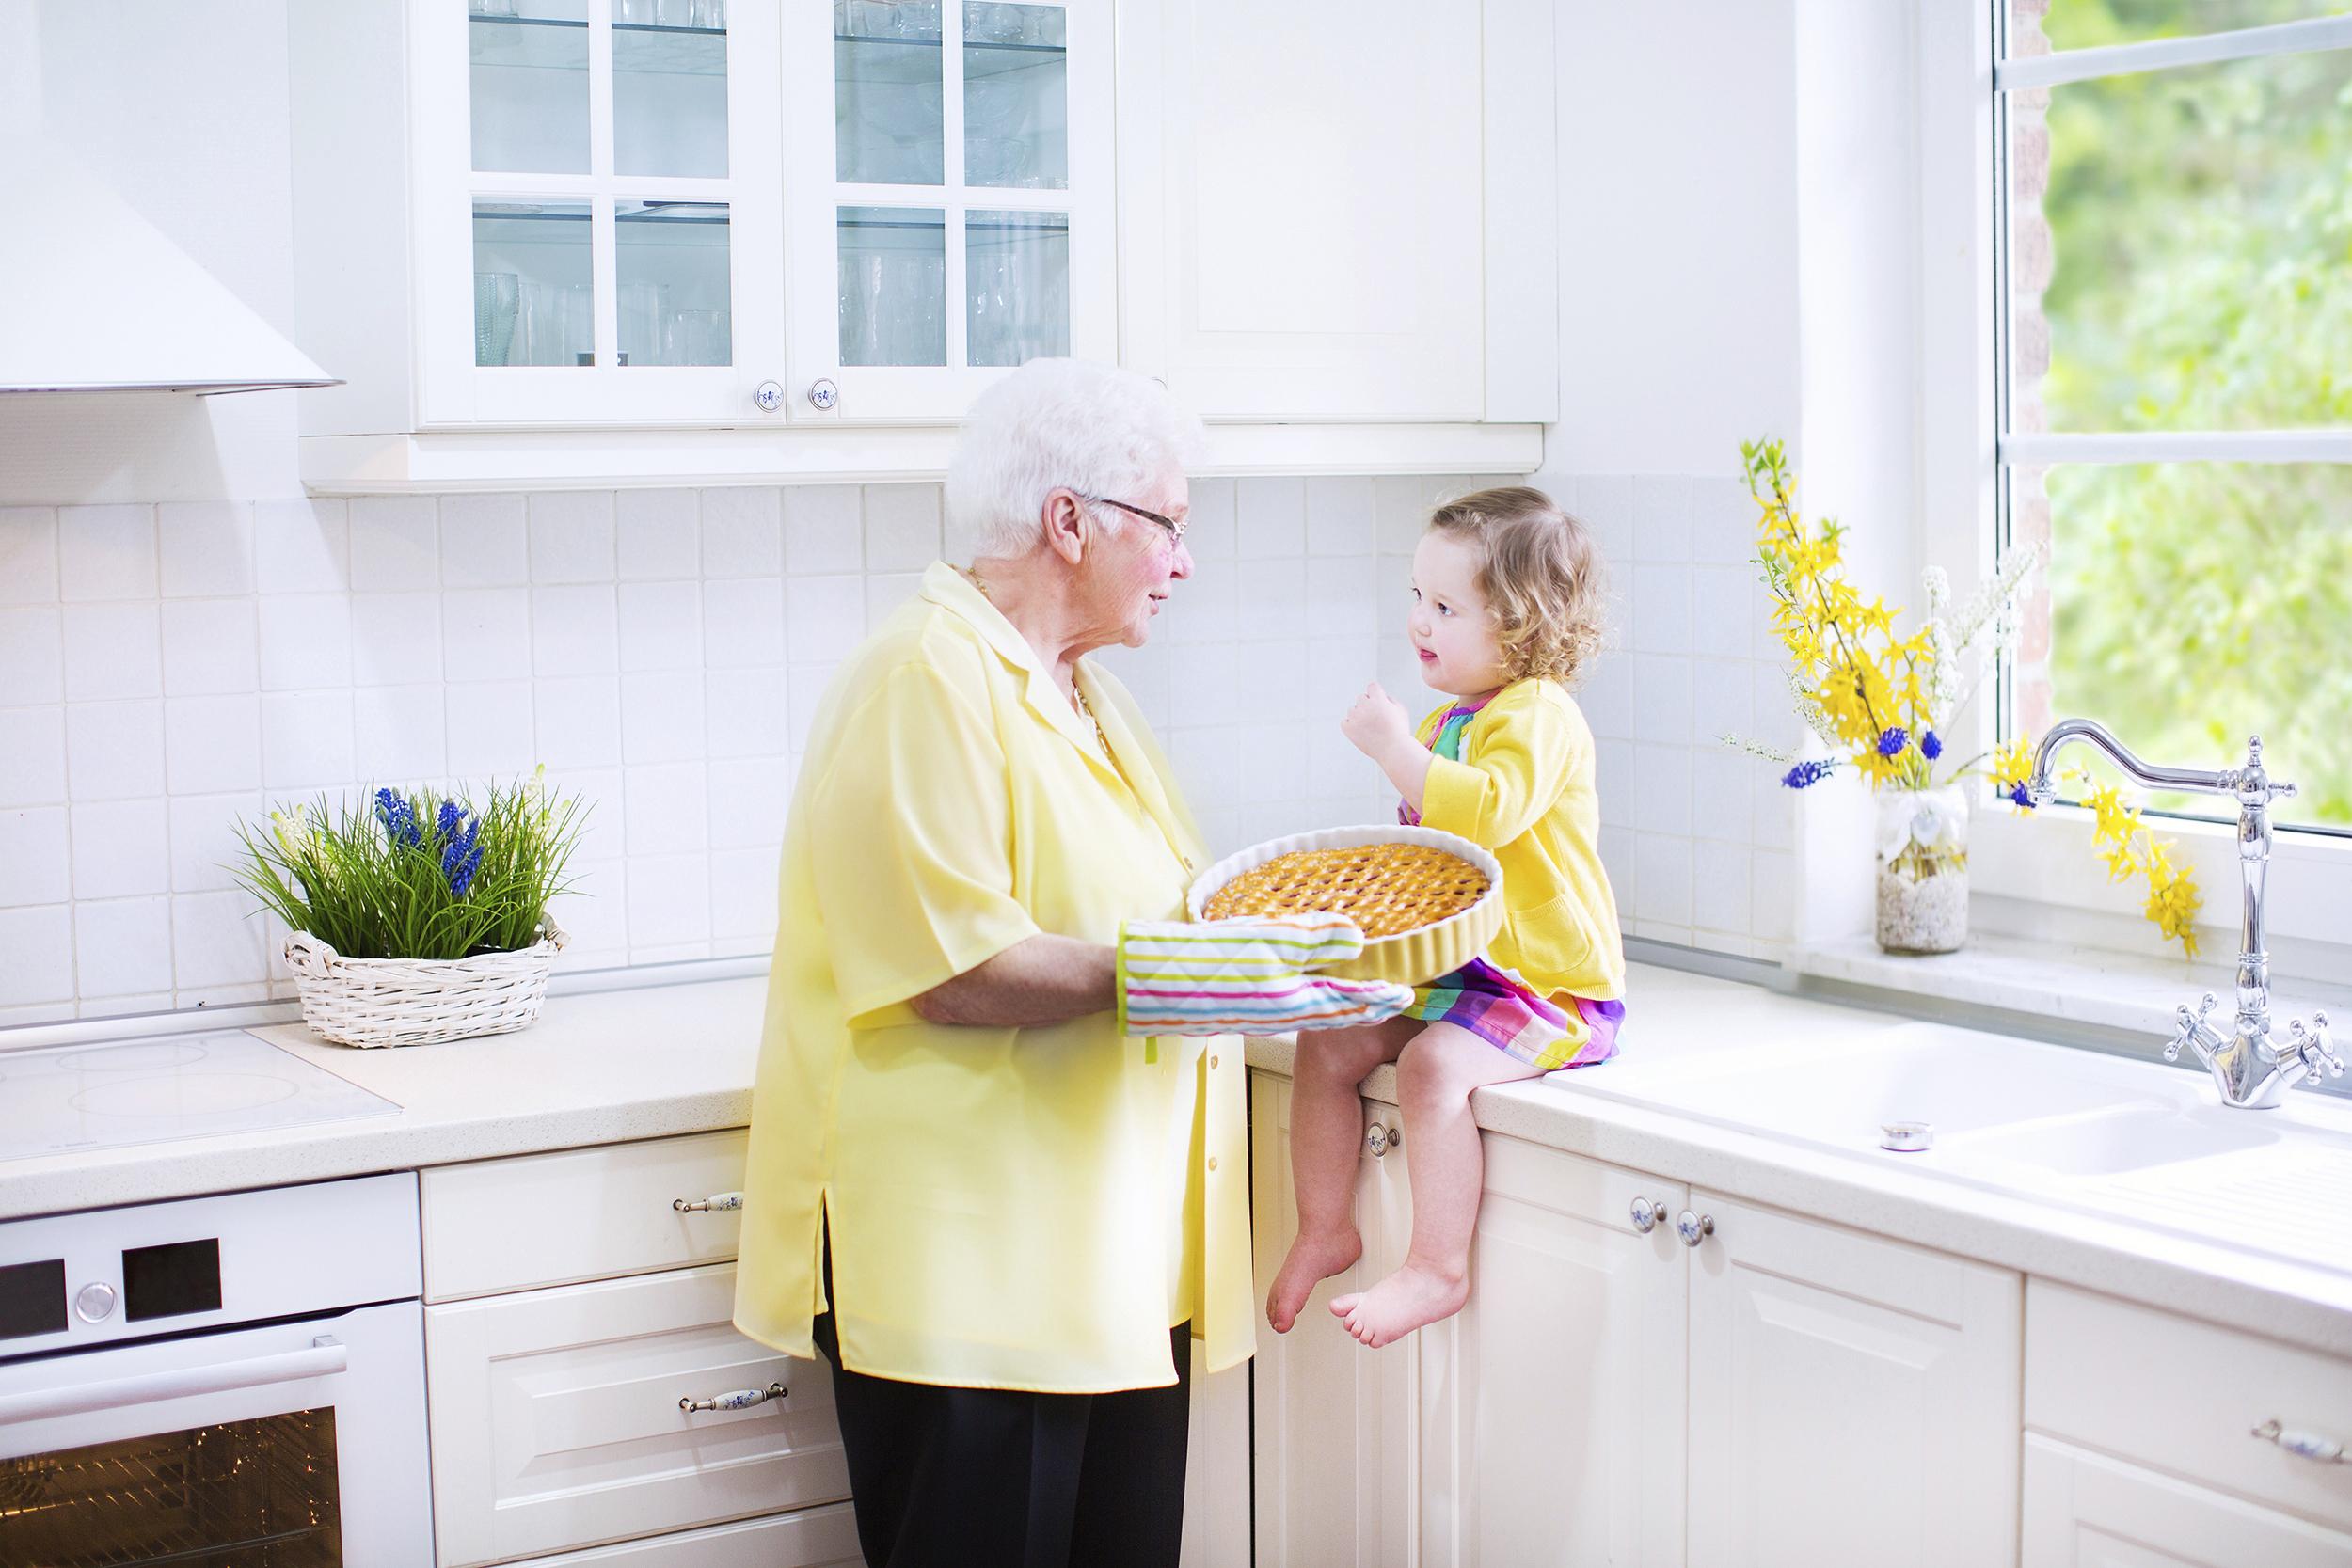 IMPALA - DEPARTAMENTO DE DIREITOS - ARQUIVO IMPALA - TODAS AS REVISTAS - ROYALTY FREE – FAMILIA - avó com neta Beautiful grandmother with her granddaughter baking pie in white kitchen